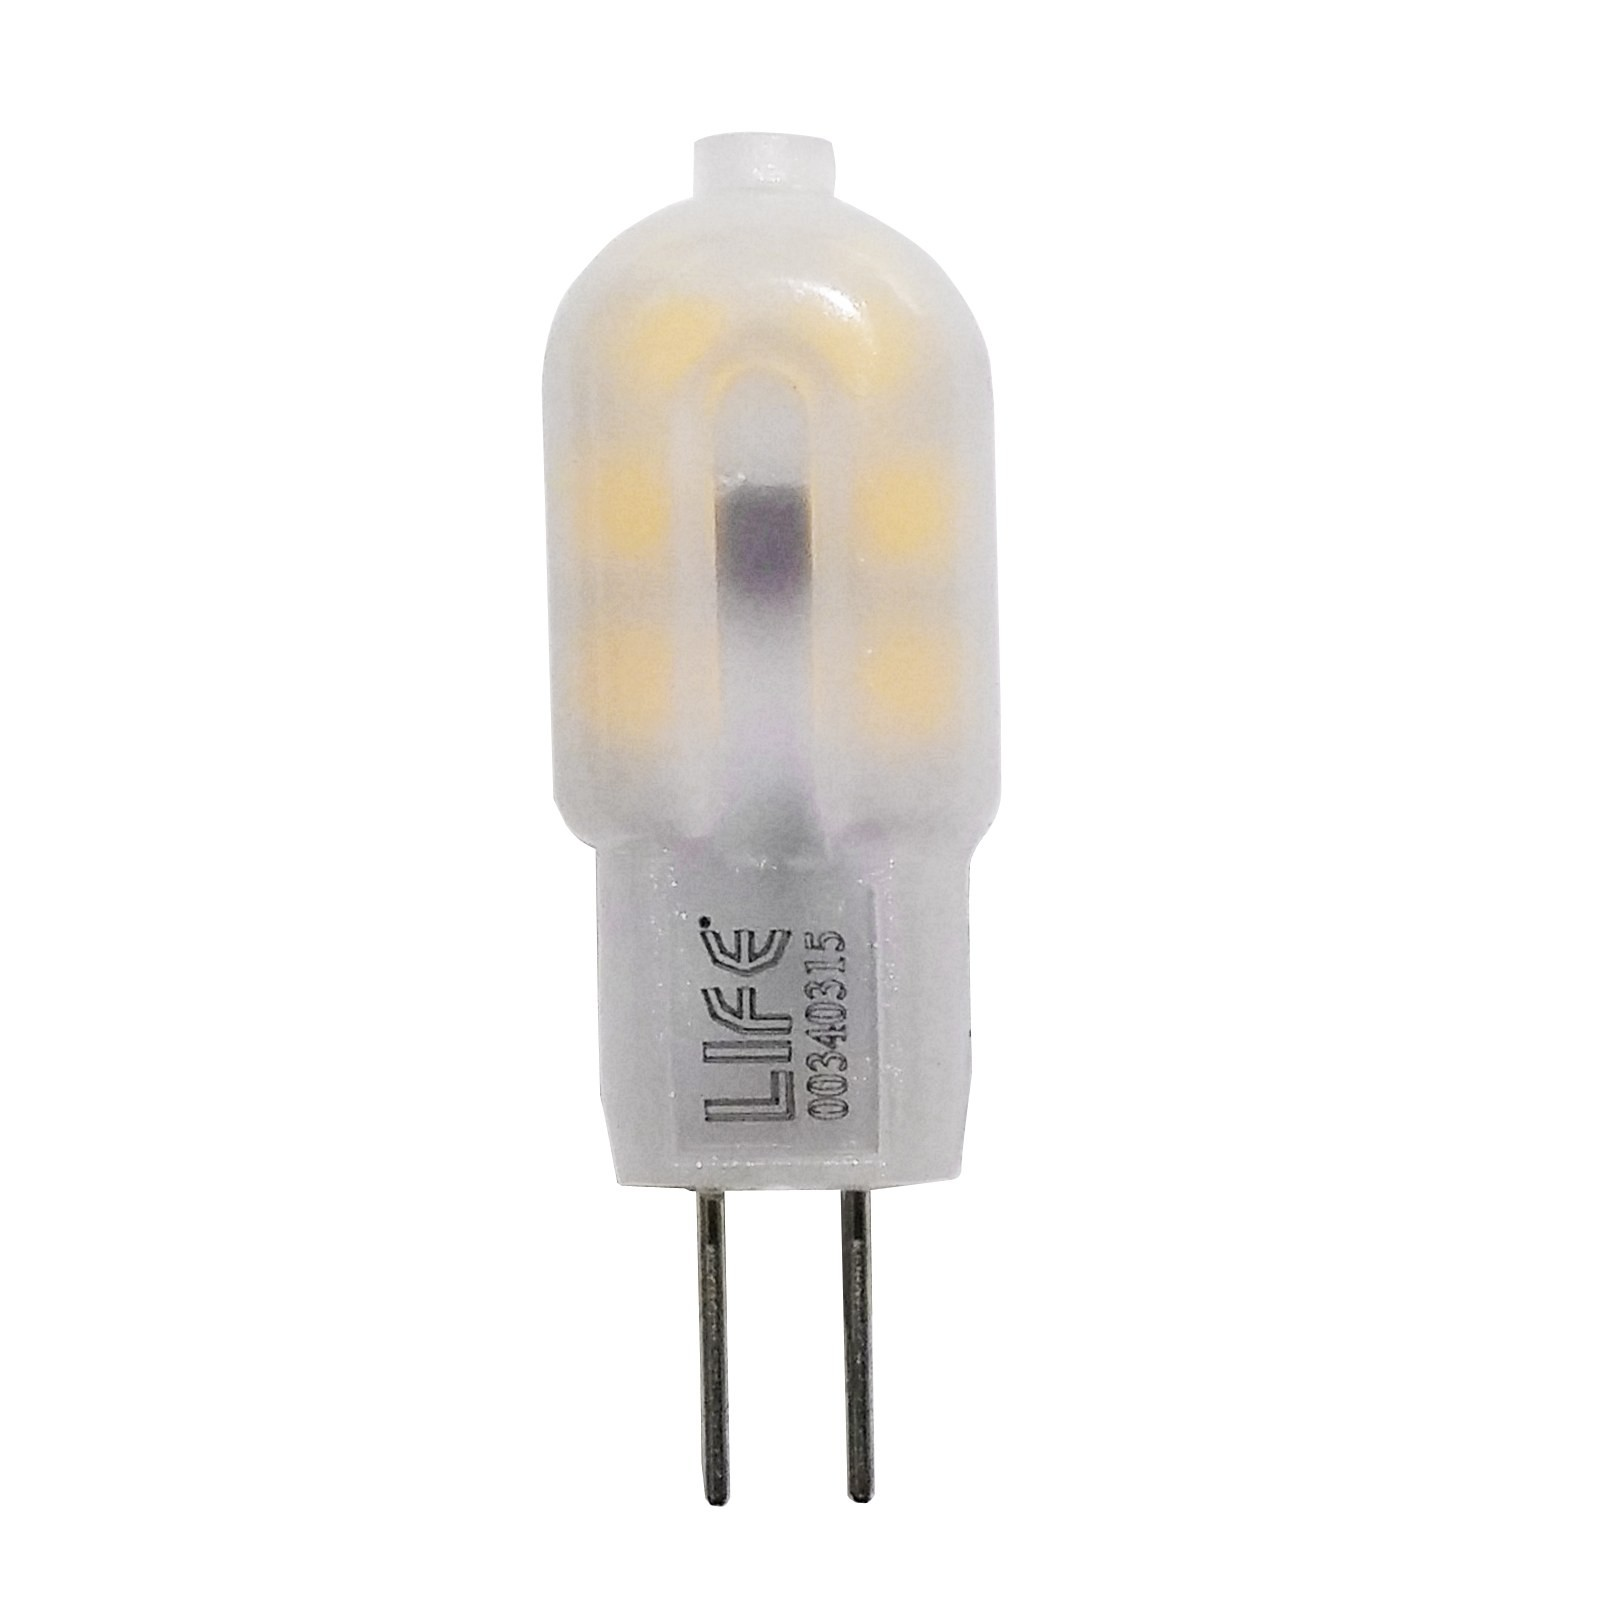 Lampadine led per faretti cheminfaisant for Lampadine led costo